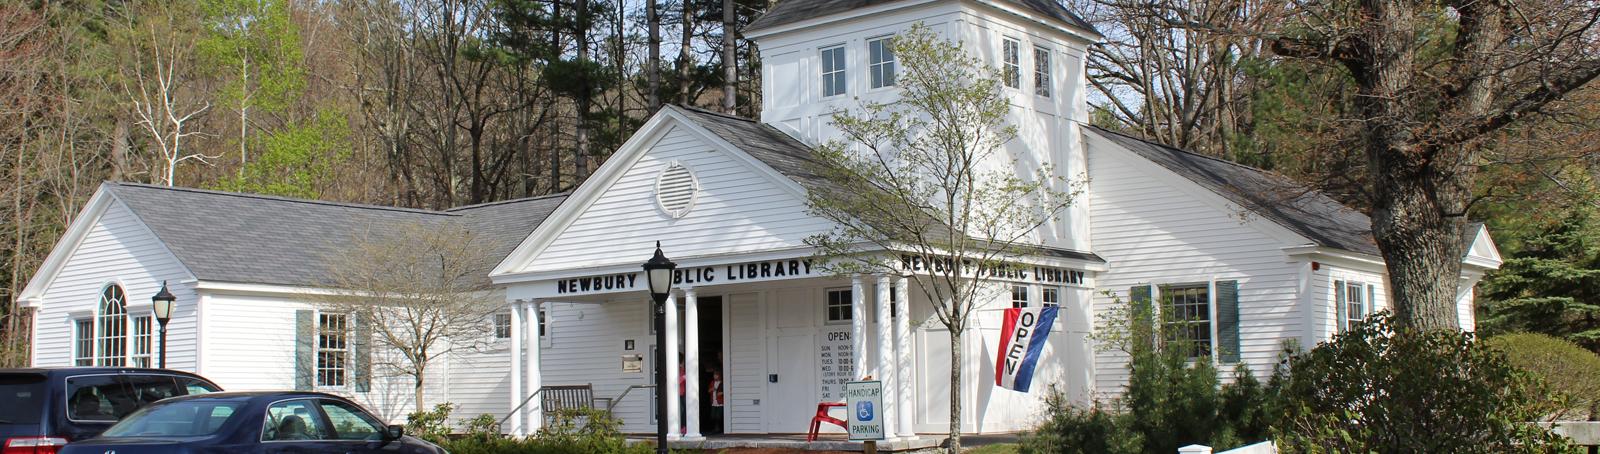 Newbury Public Library